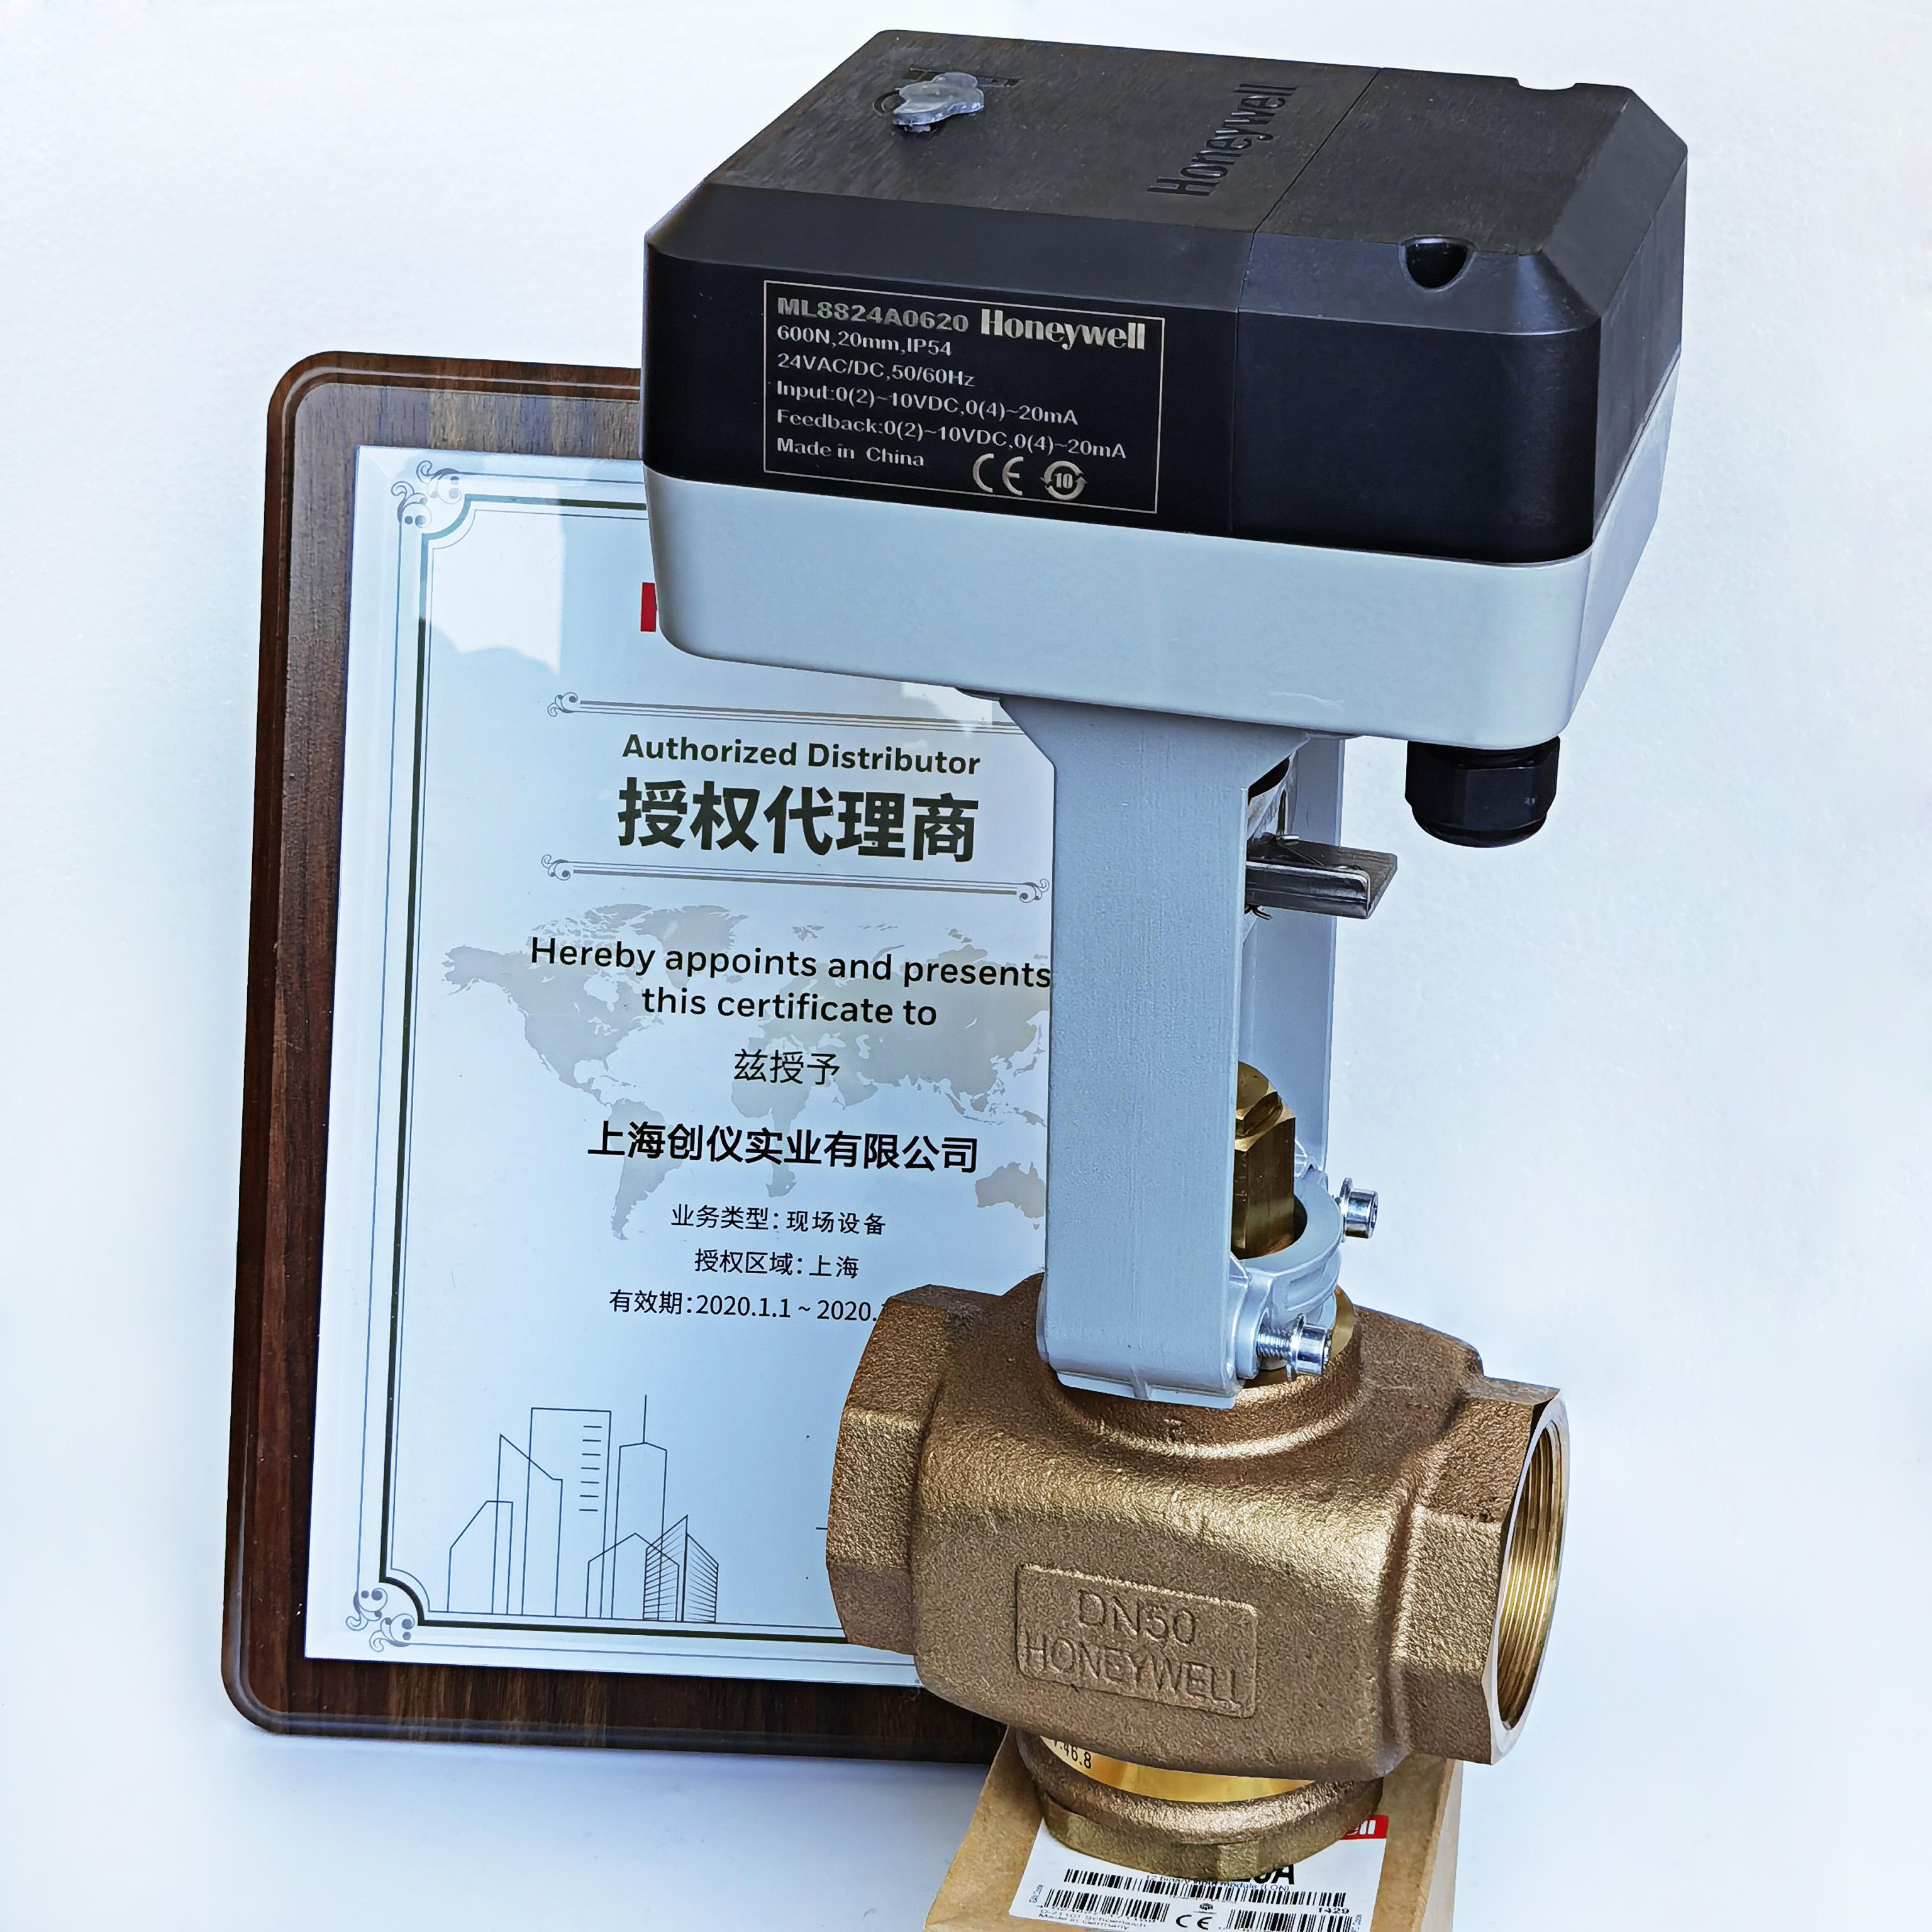 HONEYWELL ML7425 ML7421 ML7420 ML8824A 电动比例阀门执行器常见问题与解决办法